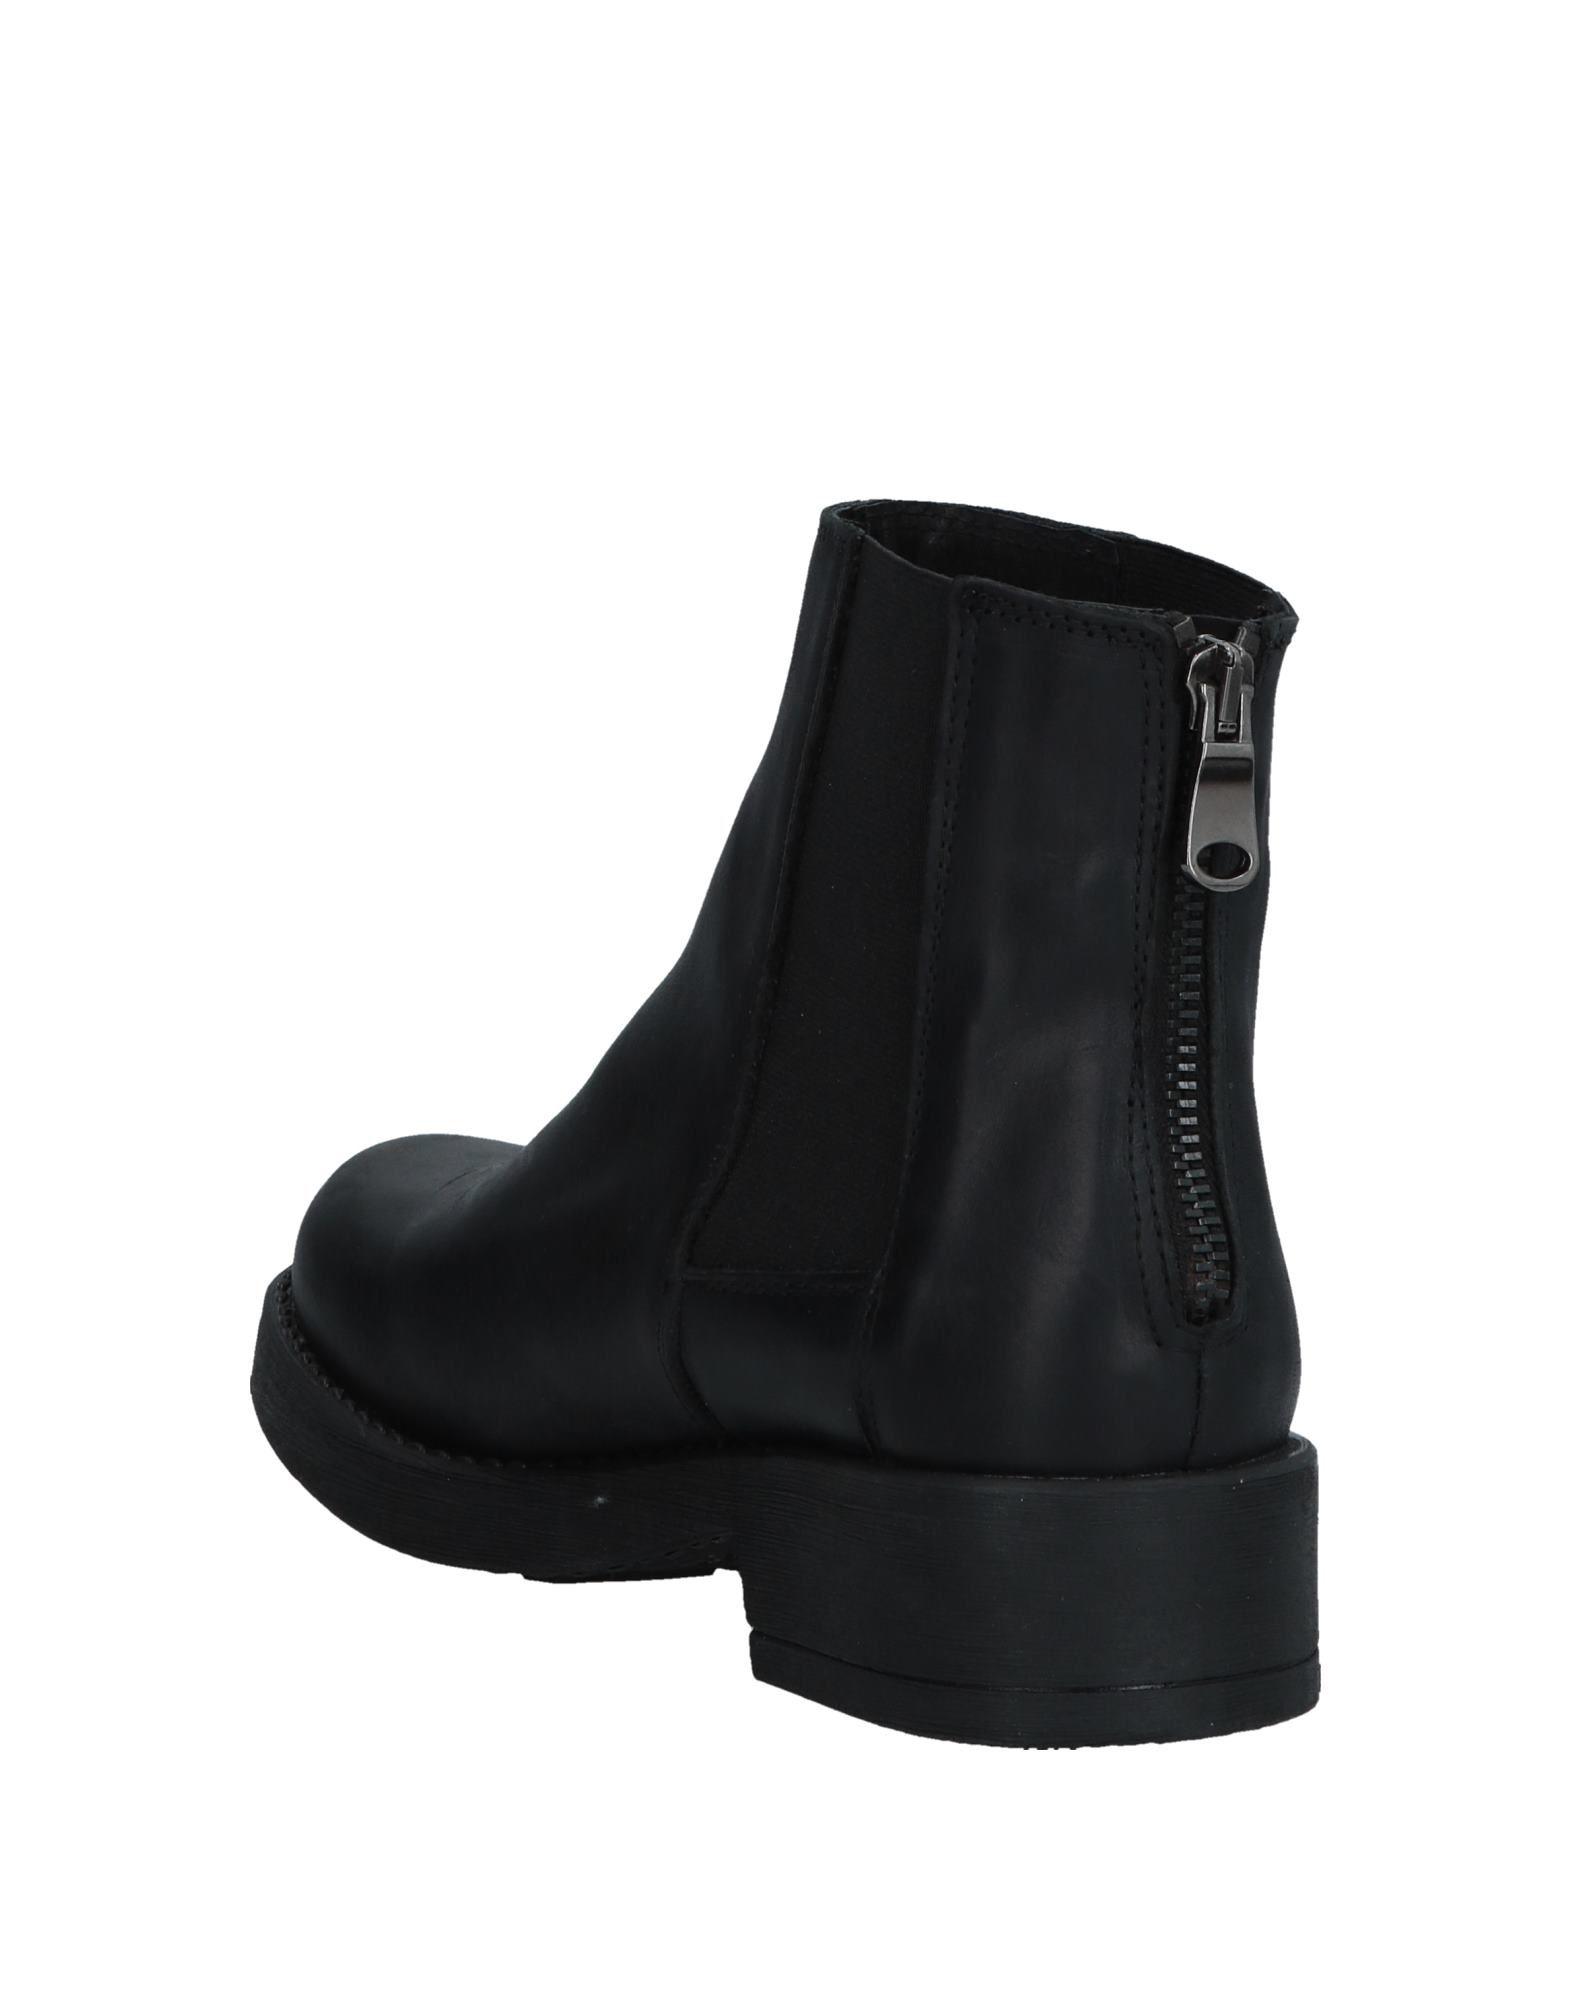 Köe Ankle Ankle Boot - Women Köe Ankle Ankle Boots online on  United Kingdom - 11550349AO b5fb1f